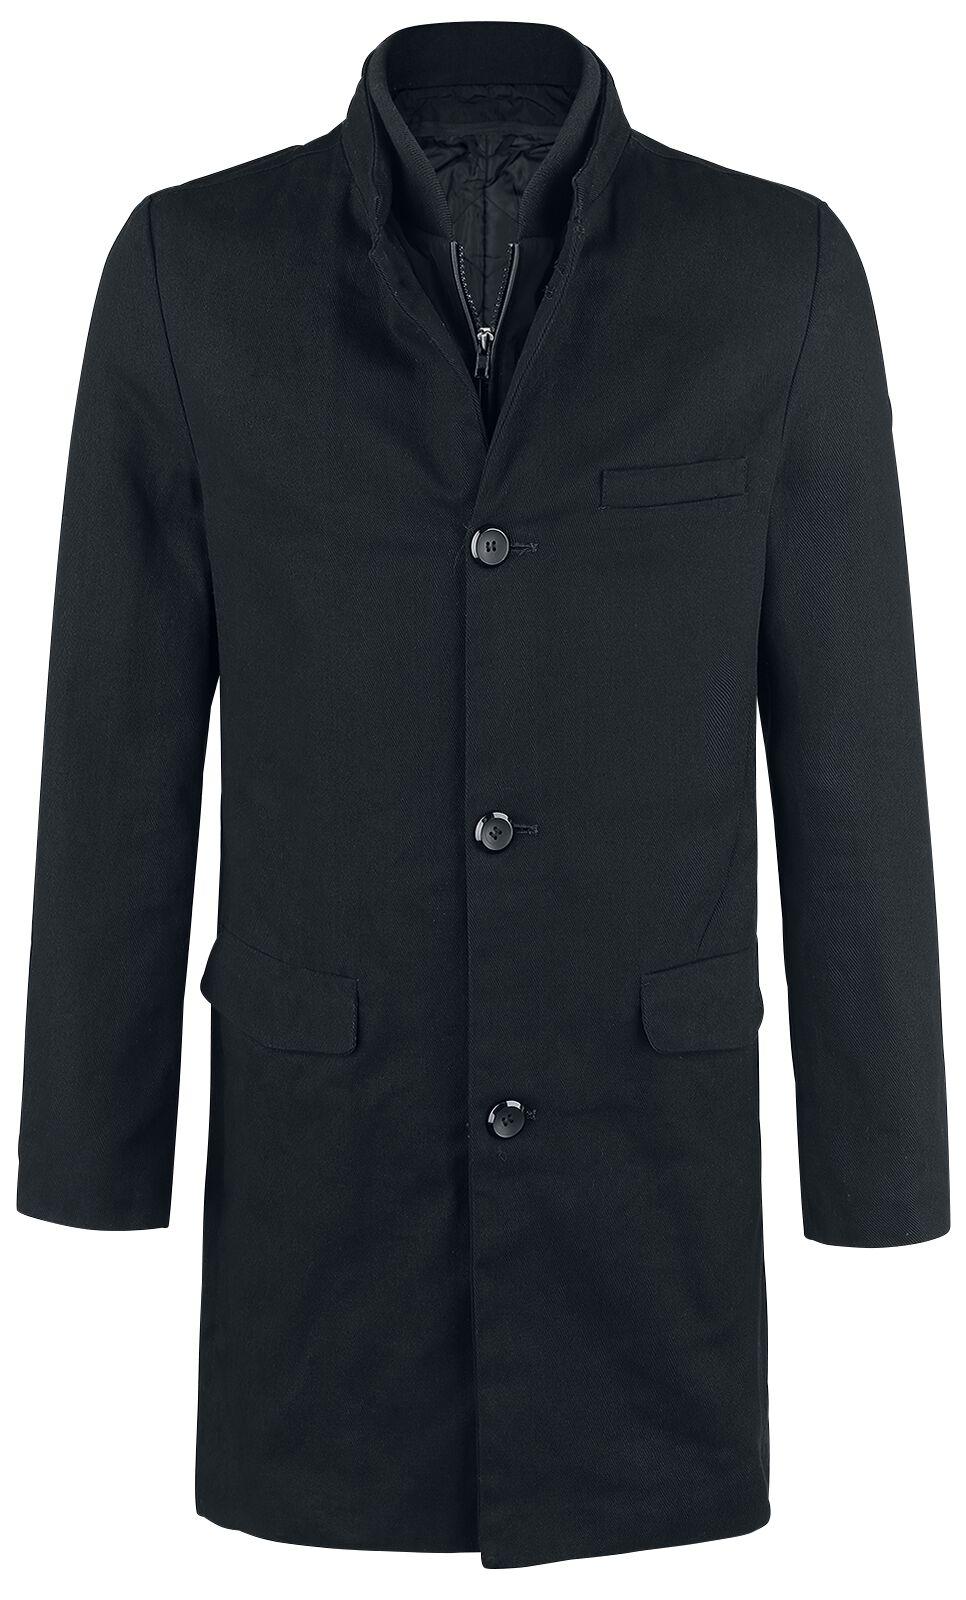 Image of   Forplay Single-Breasted Coat Frakke sort